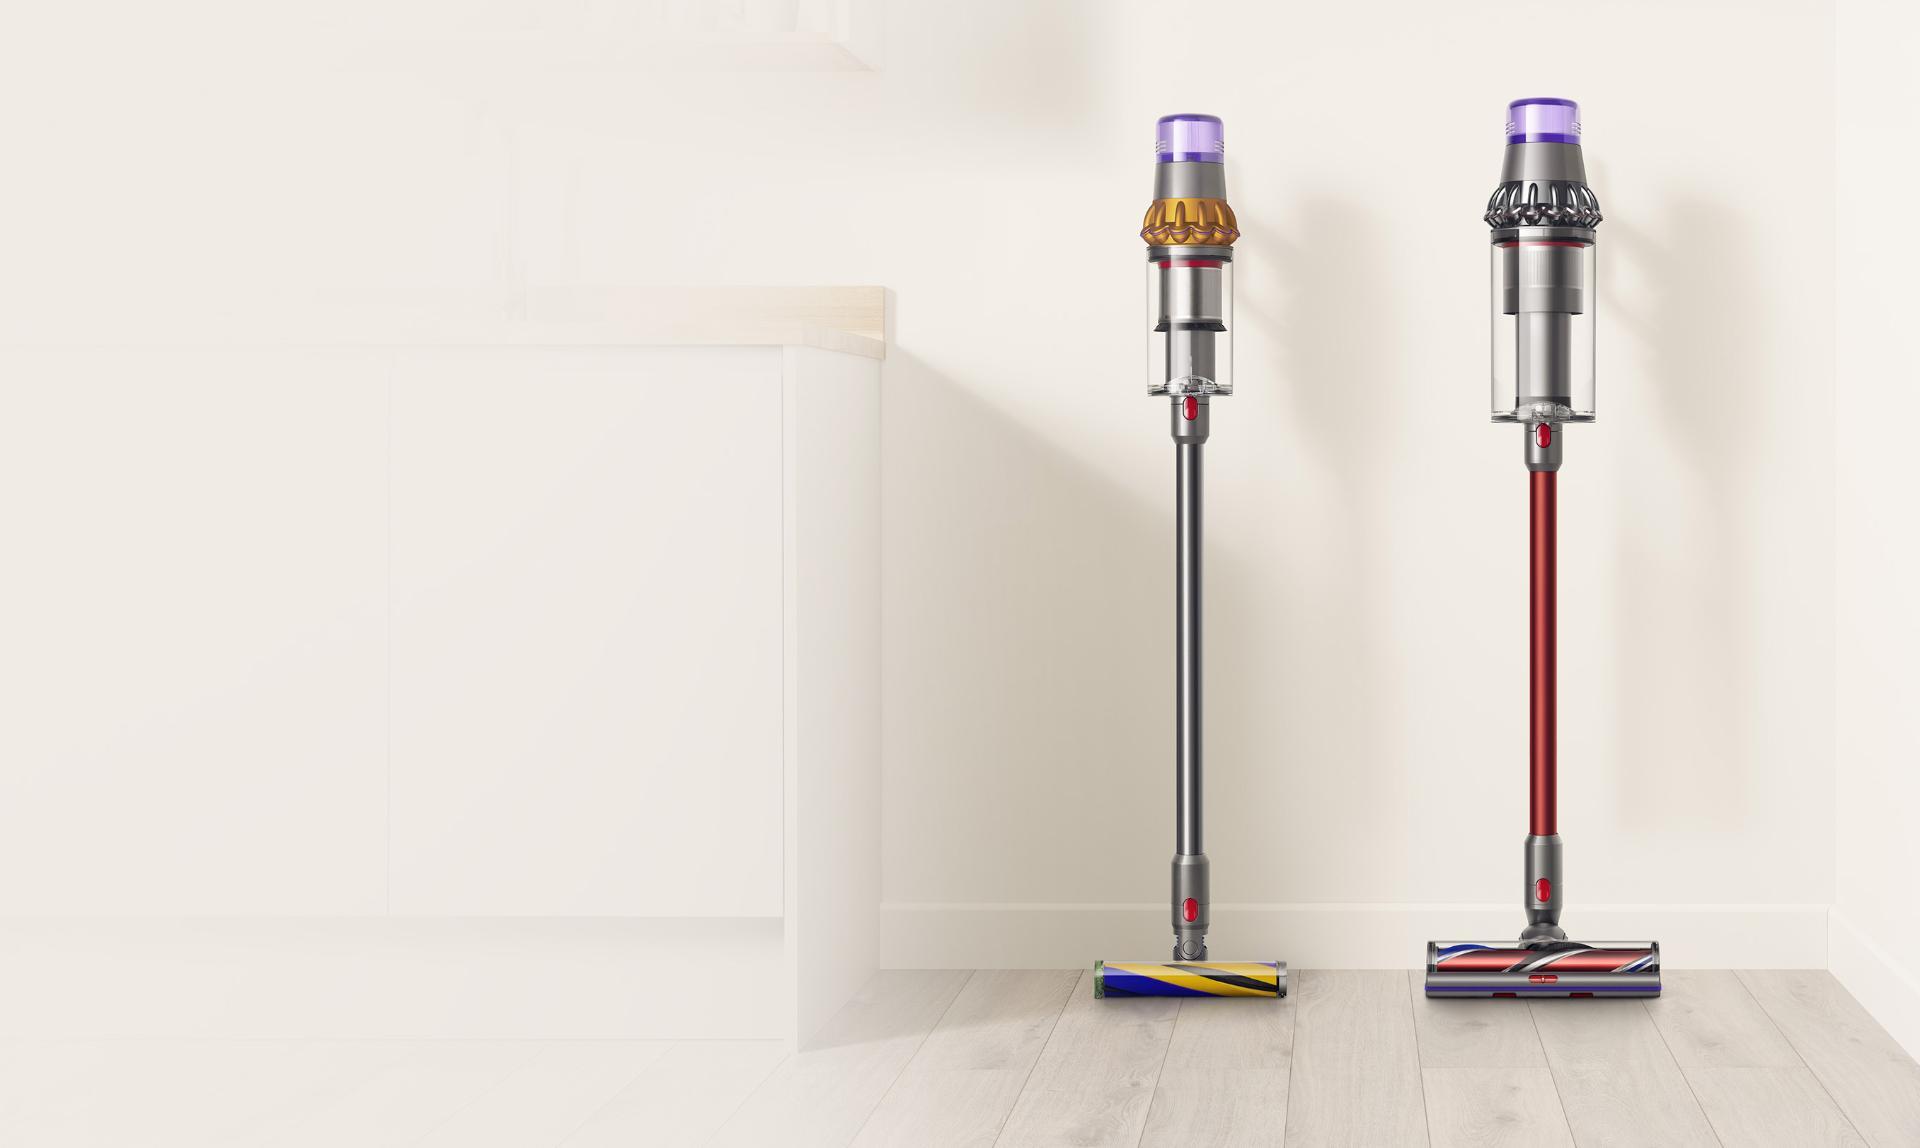 A Dyson V15 Detect cordless vacuum cleaner next to a Dyson Outsize cordless vacuum